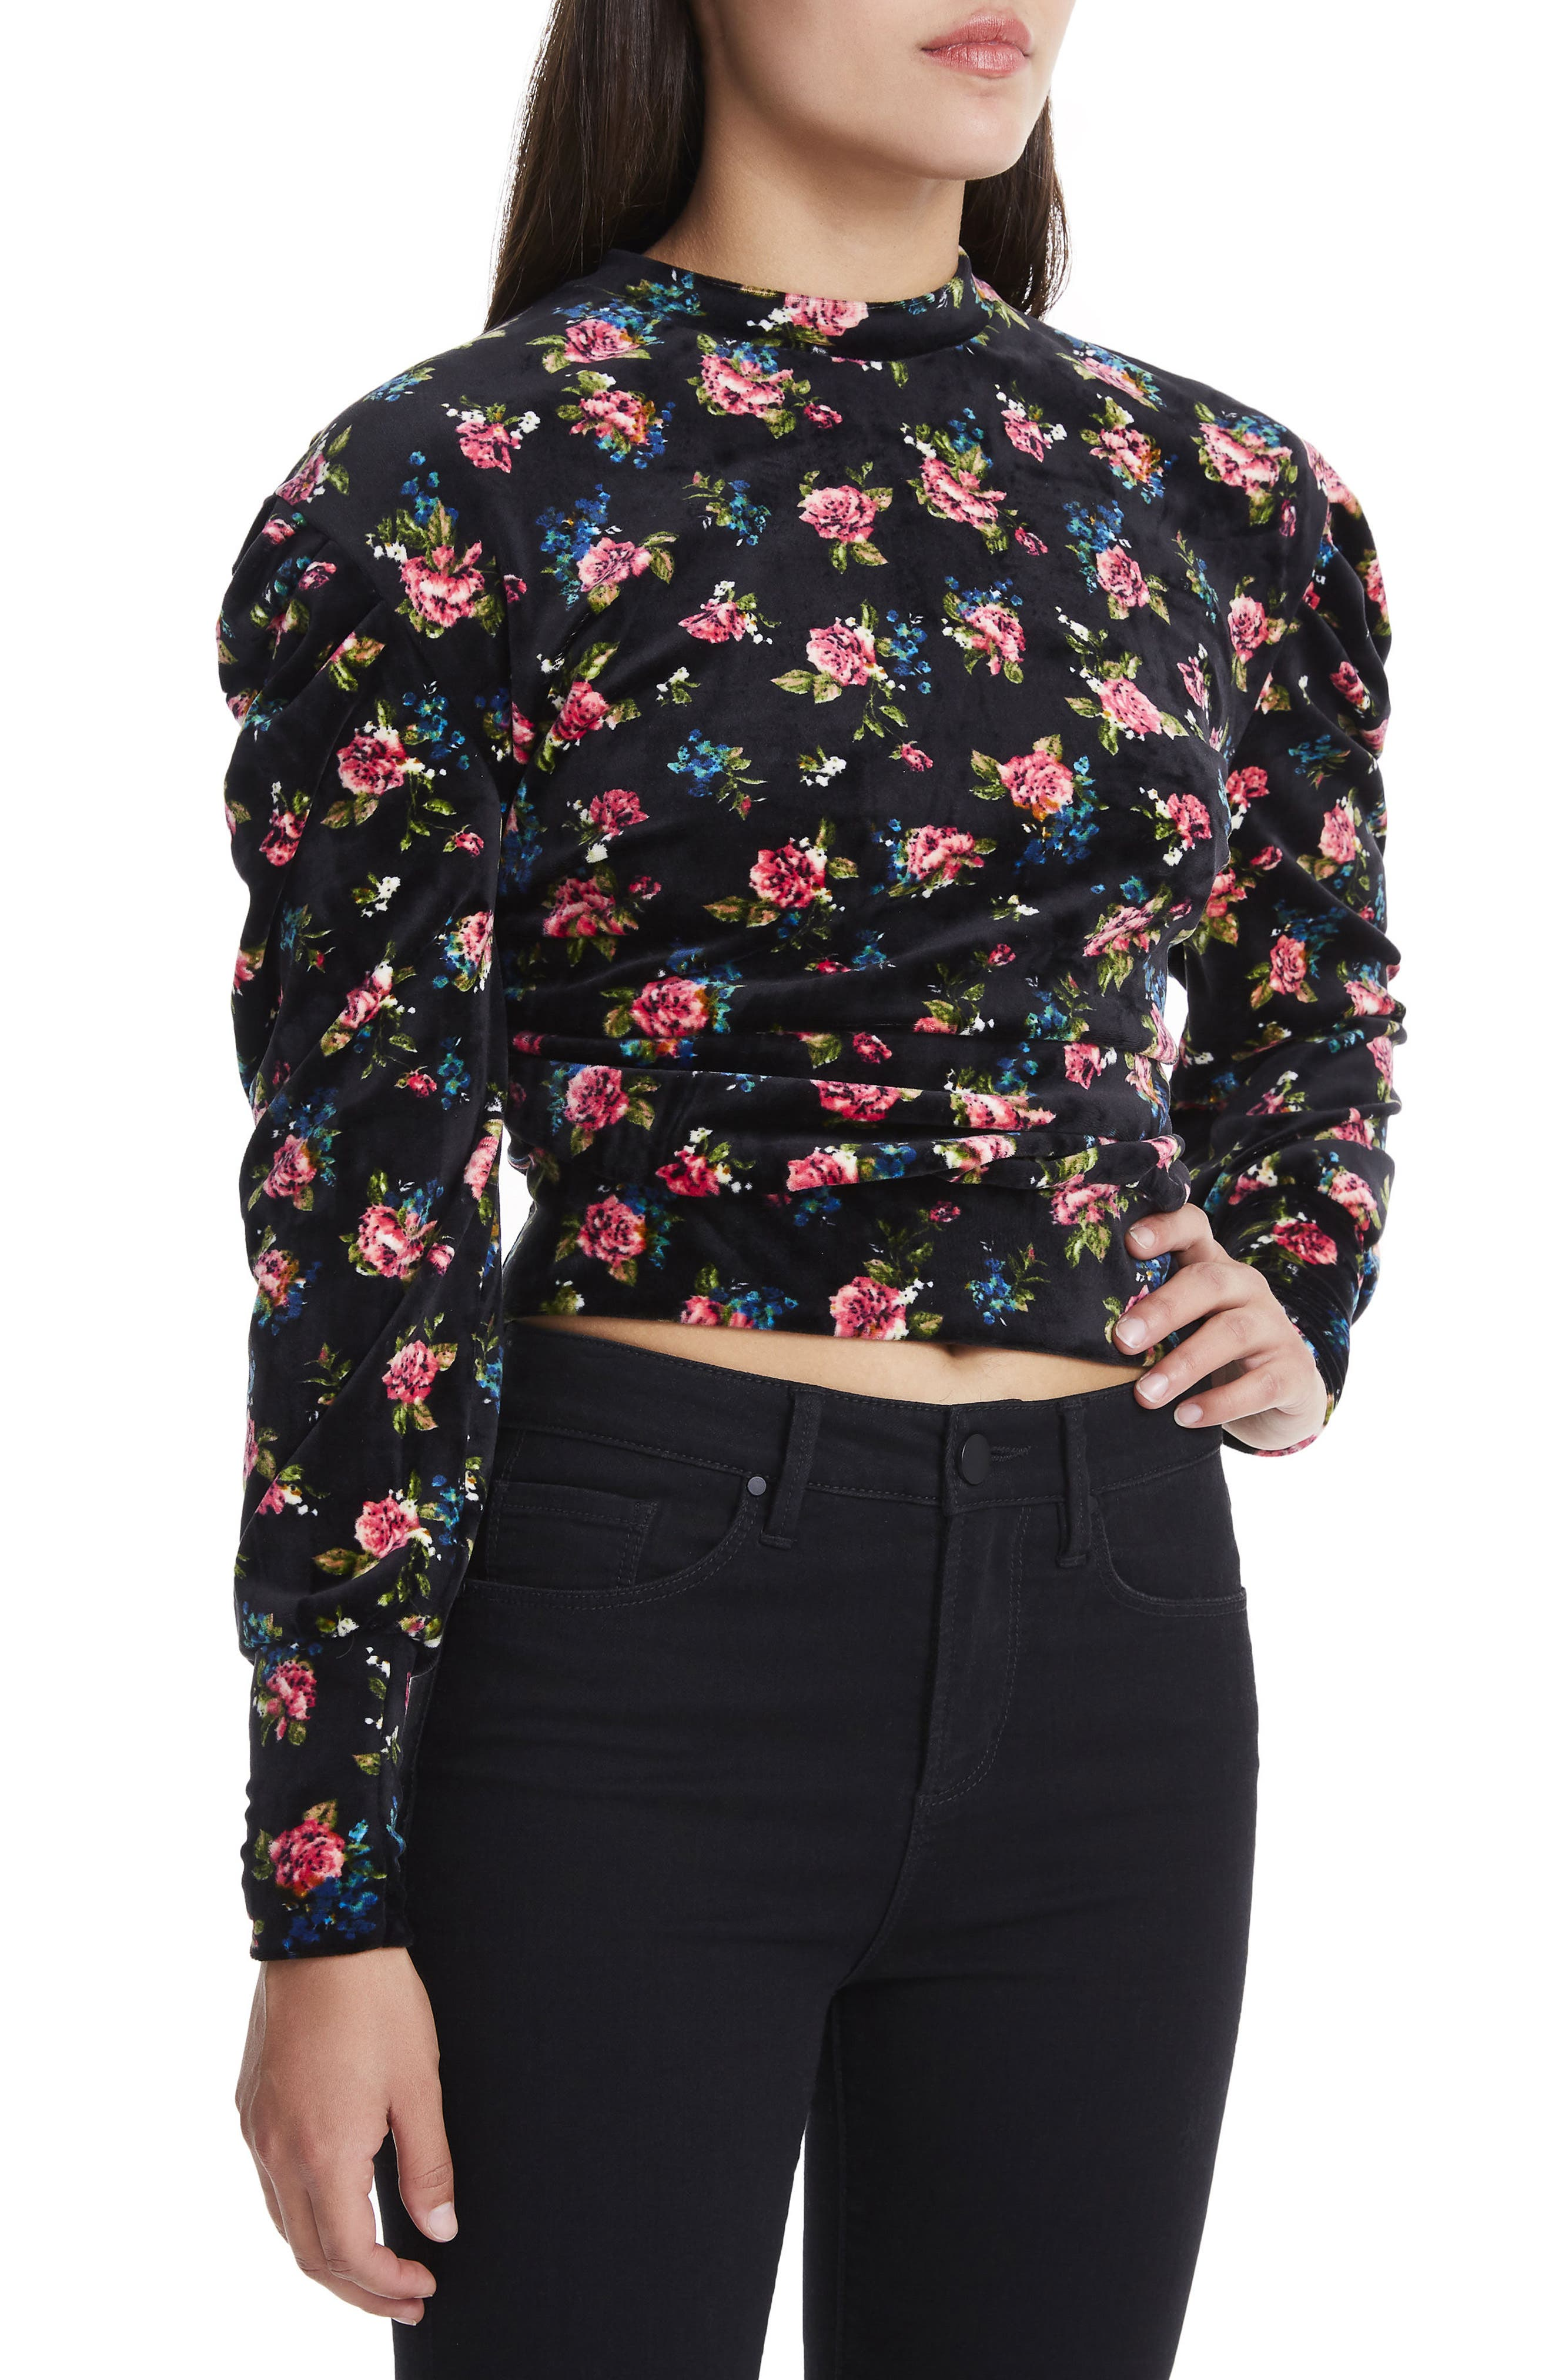 James Balloon Sleeve Sweatshirt,                         Main,                         color, Flower Print